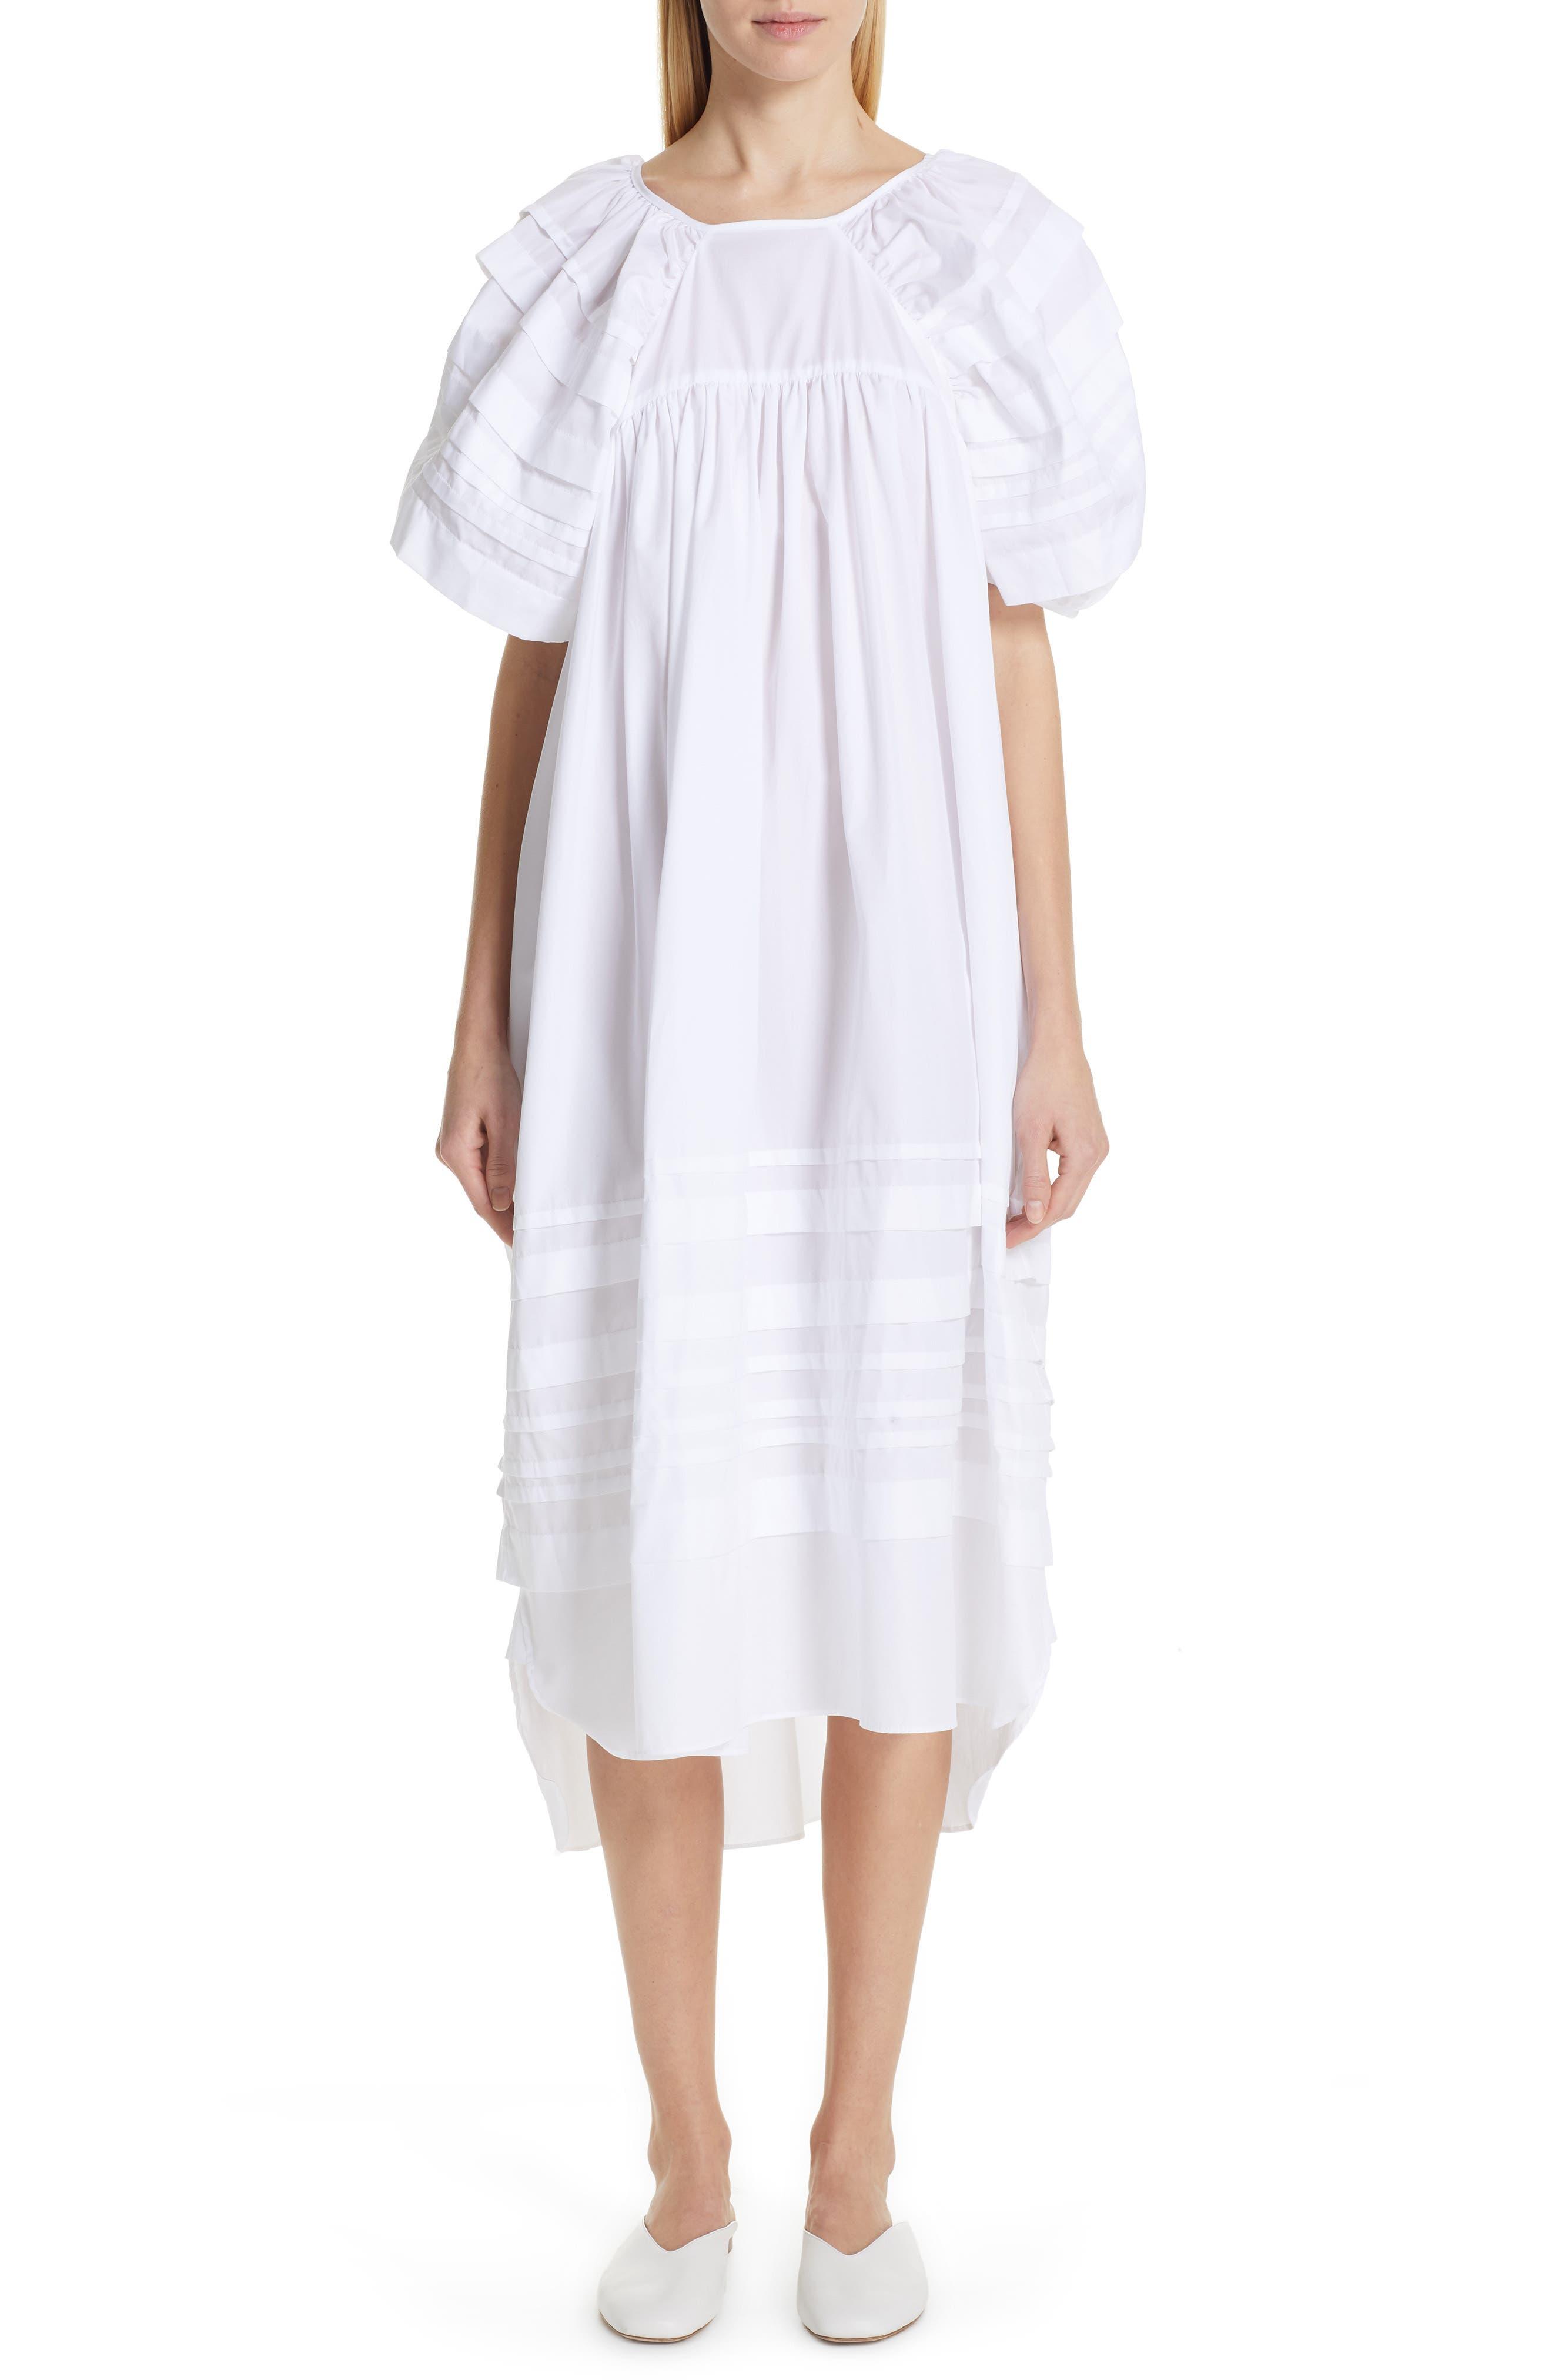 Cecilie Bahnsen Penelope Dress, US / 10 UK - White